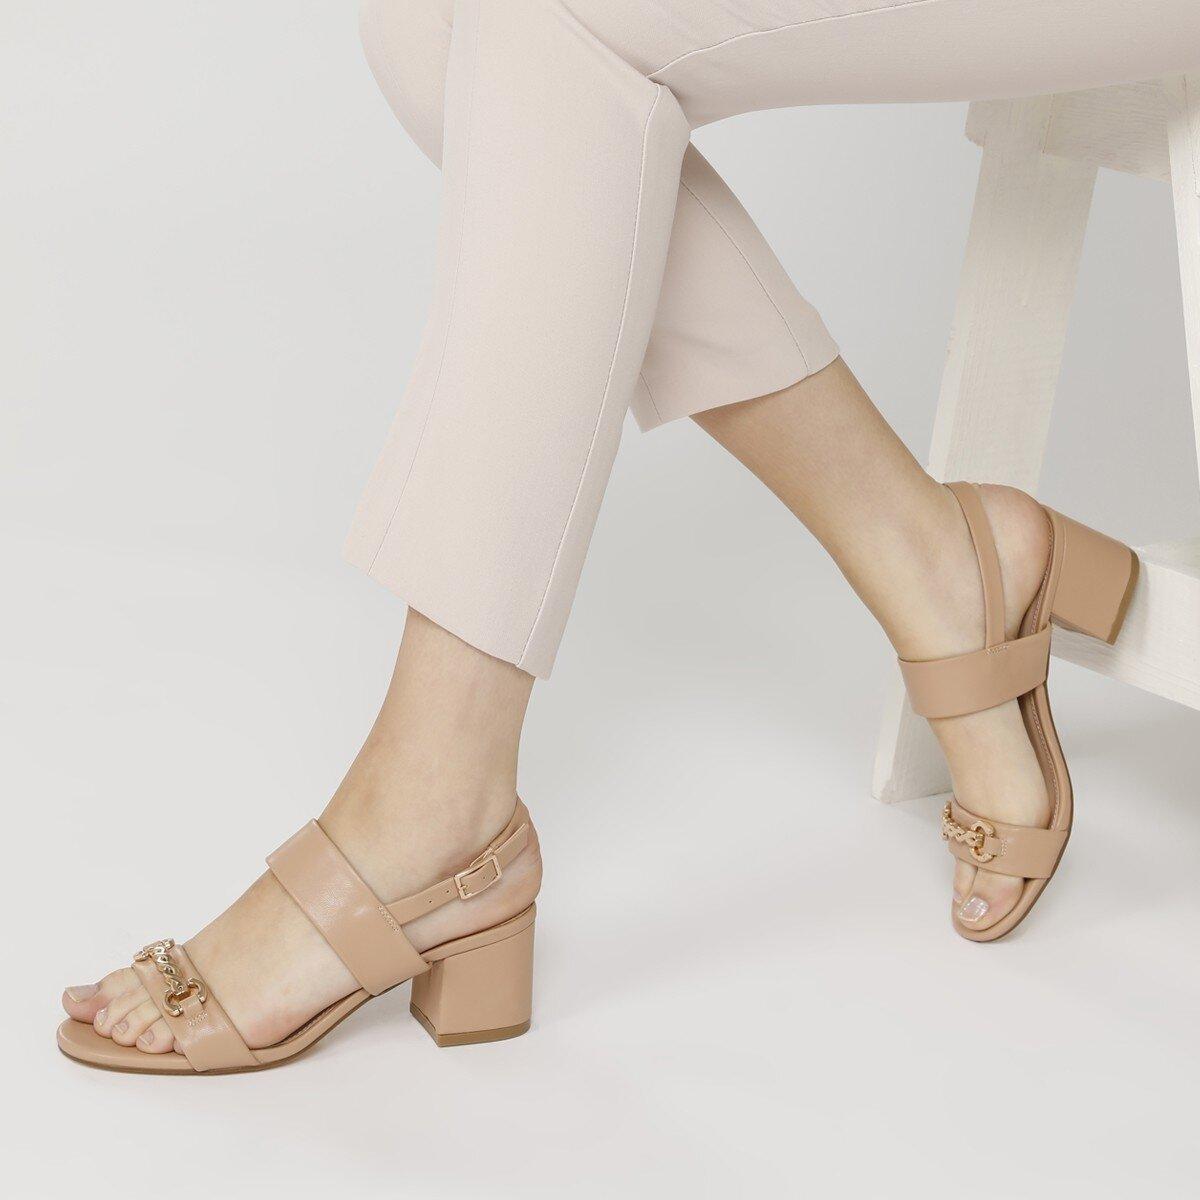 SAMARA 1FX Naturel Kadın Topuklu Sandalet